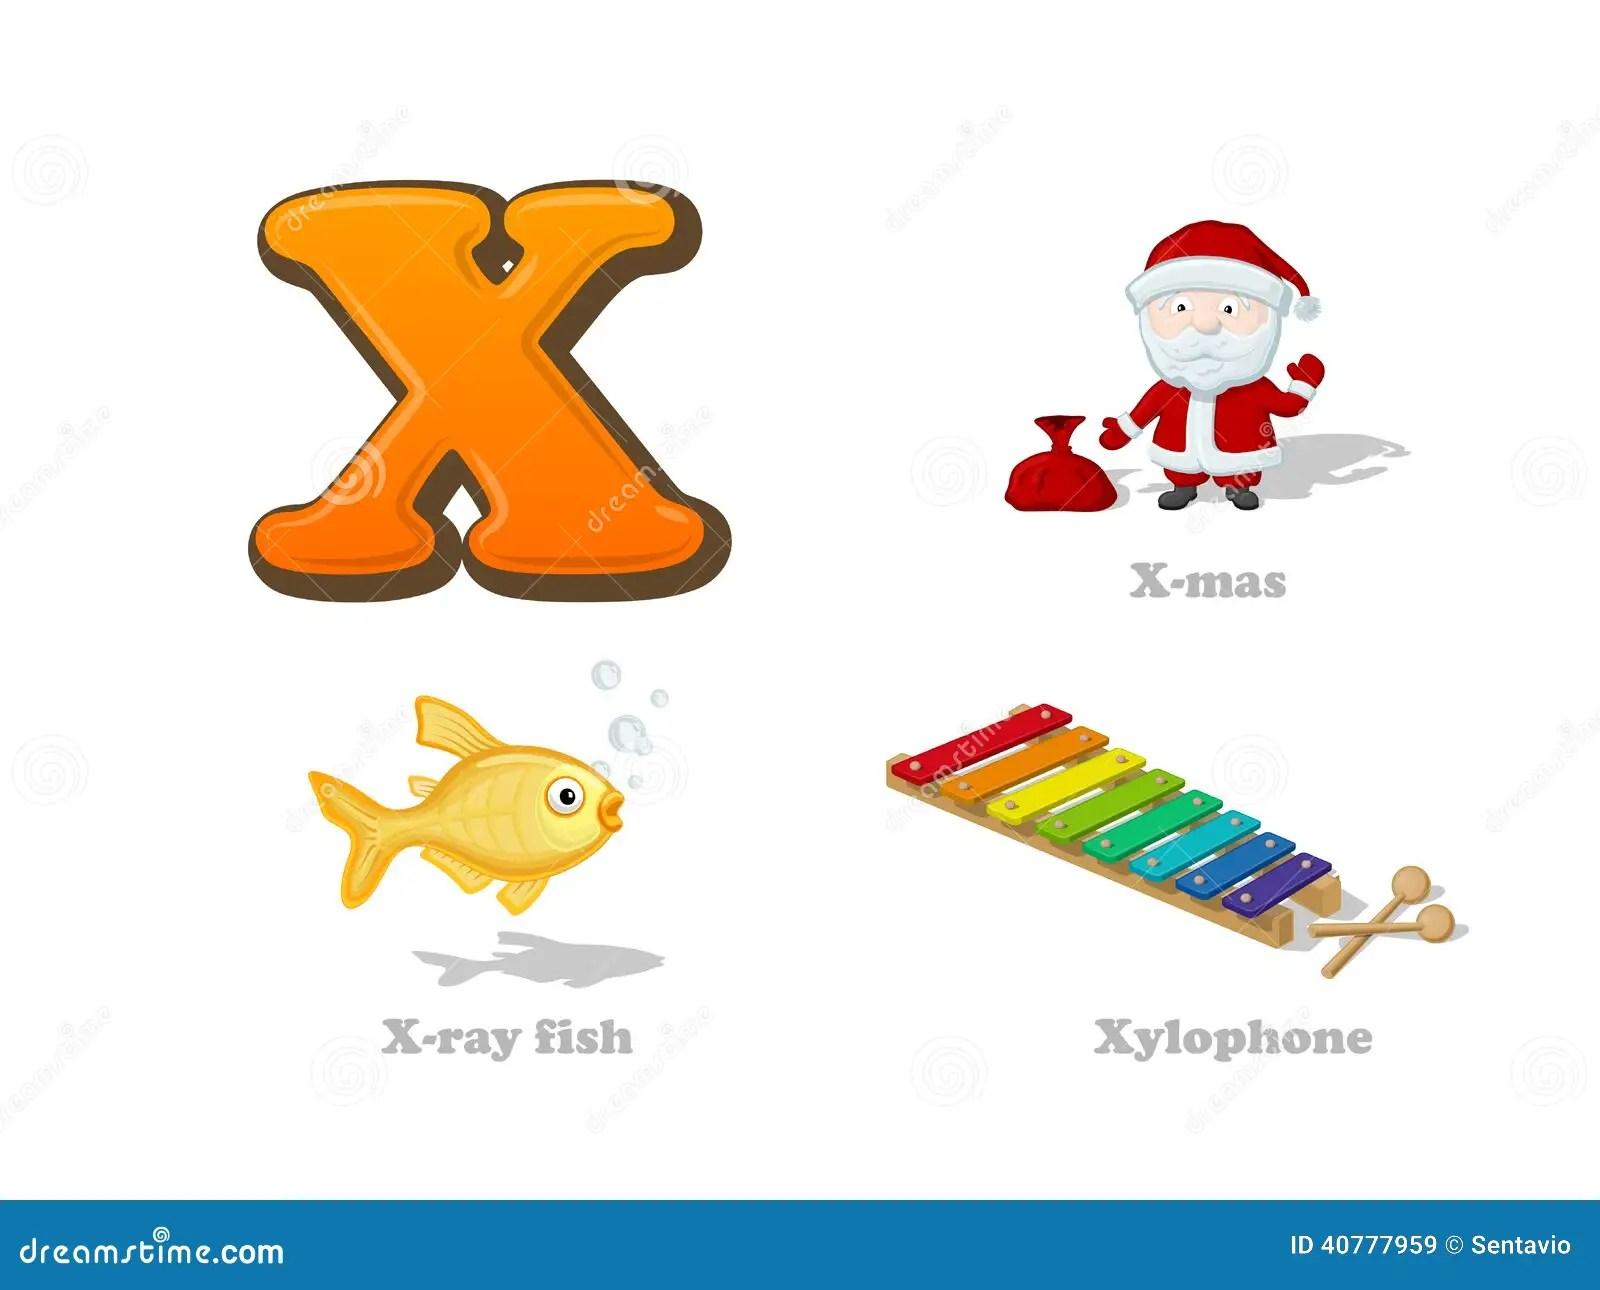 Abc Letter X Funny Kid Icons Set X Mas X Ray Fish